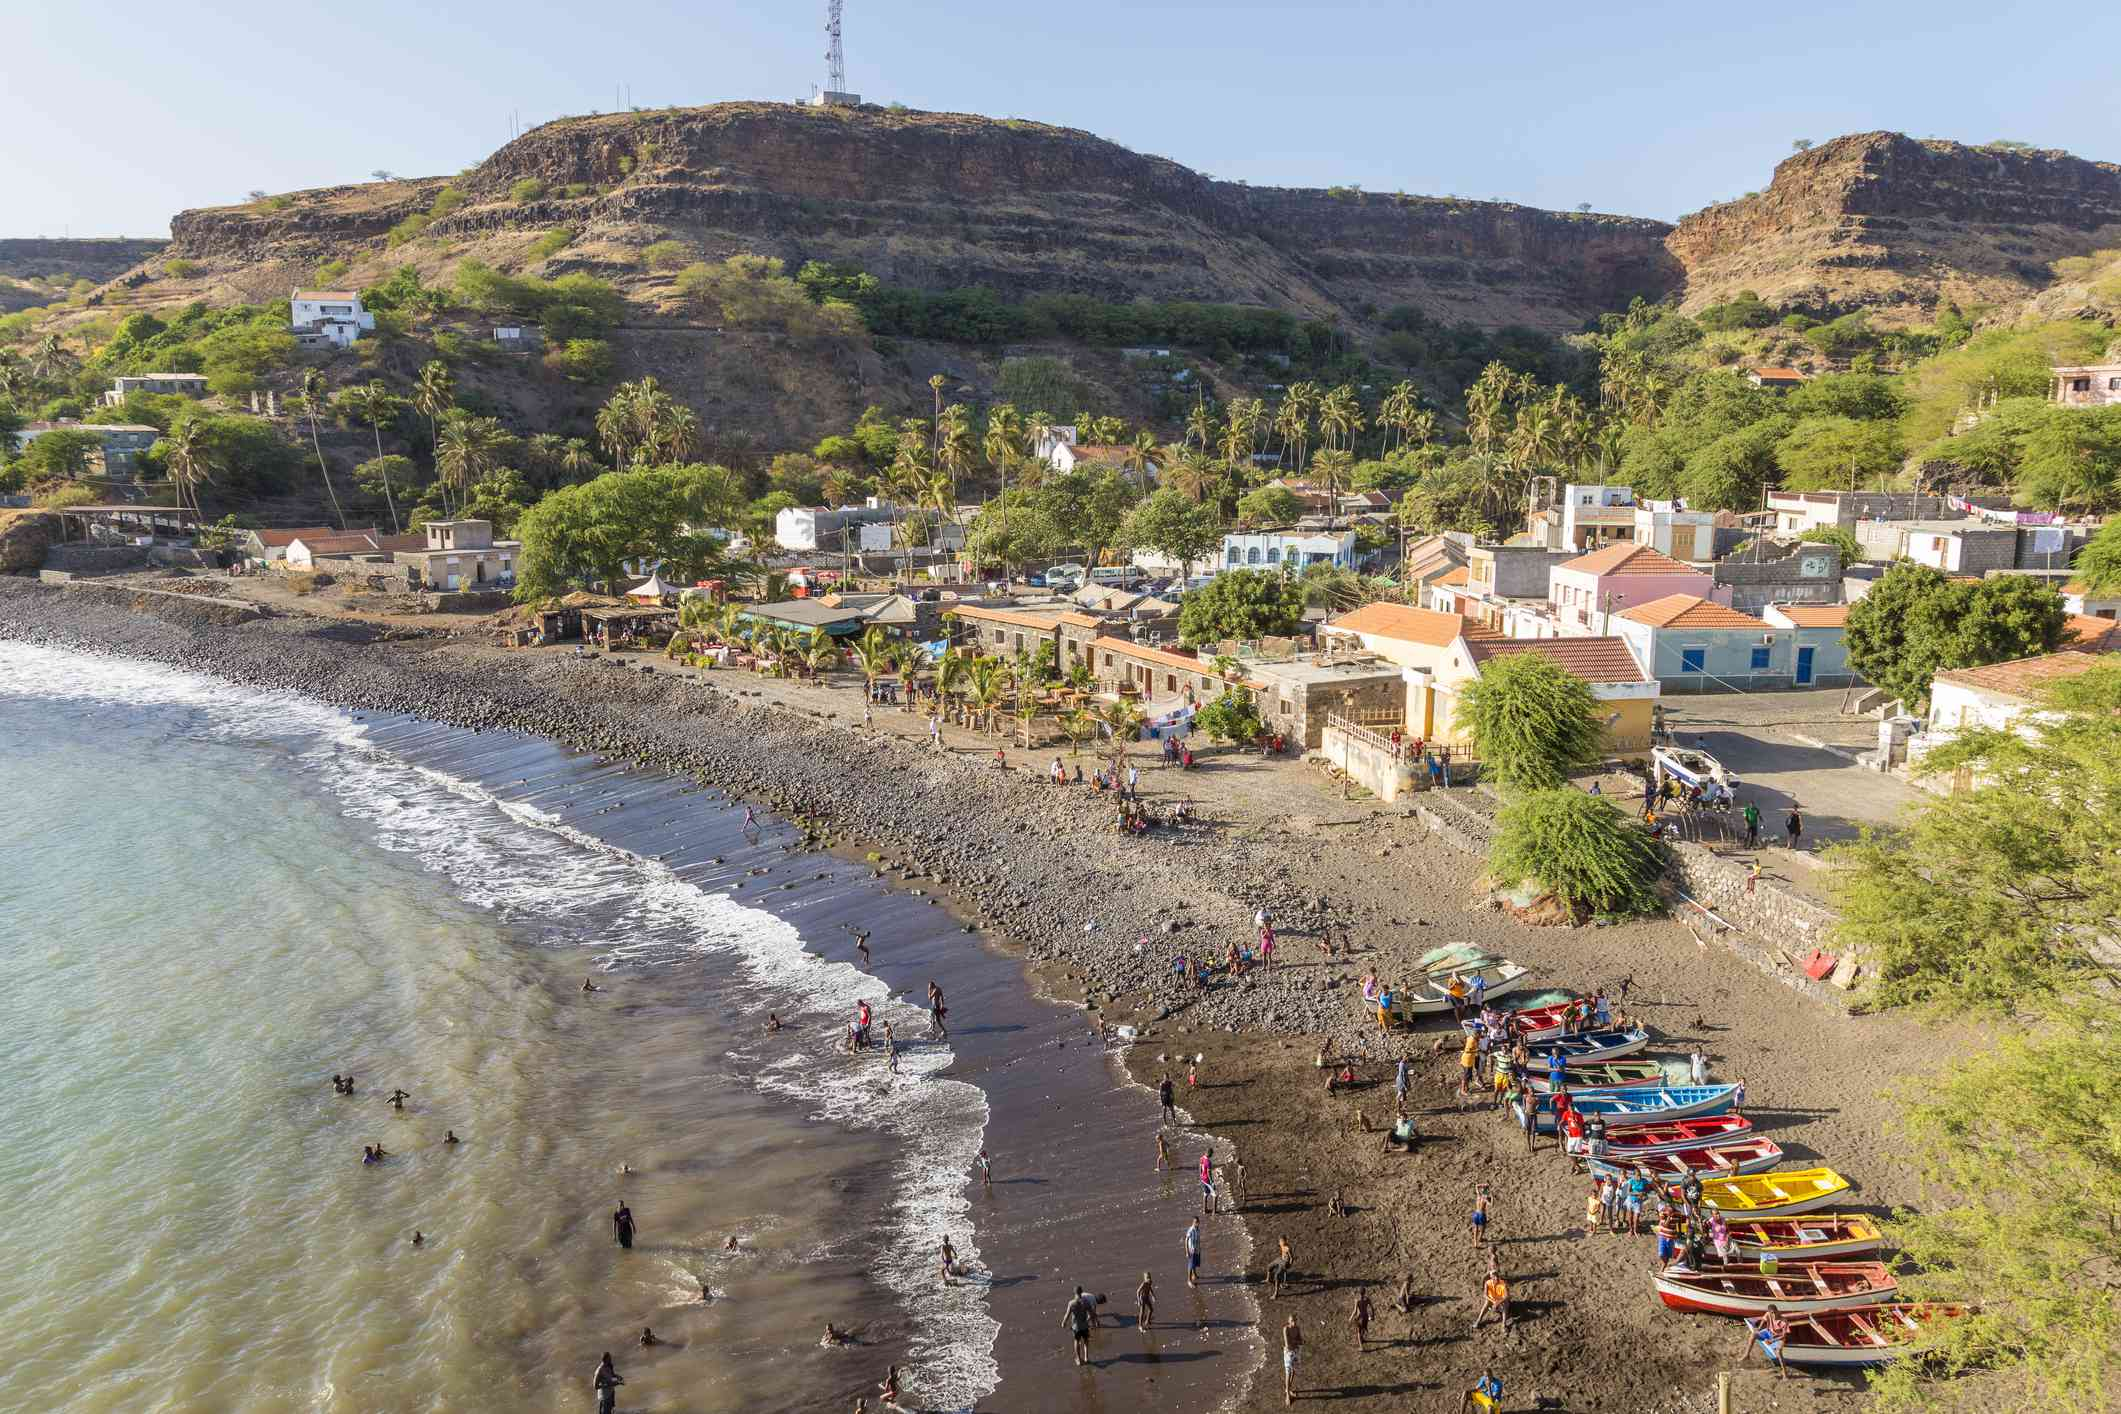 Cabo Verde in the Atlantic Ocean